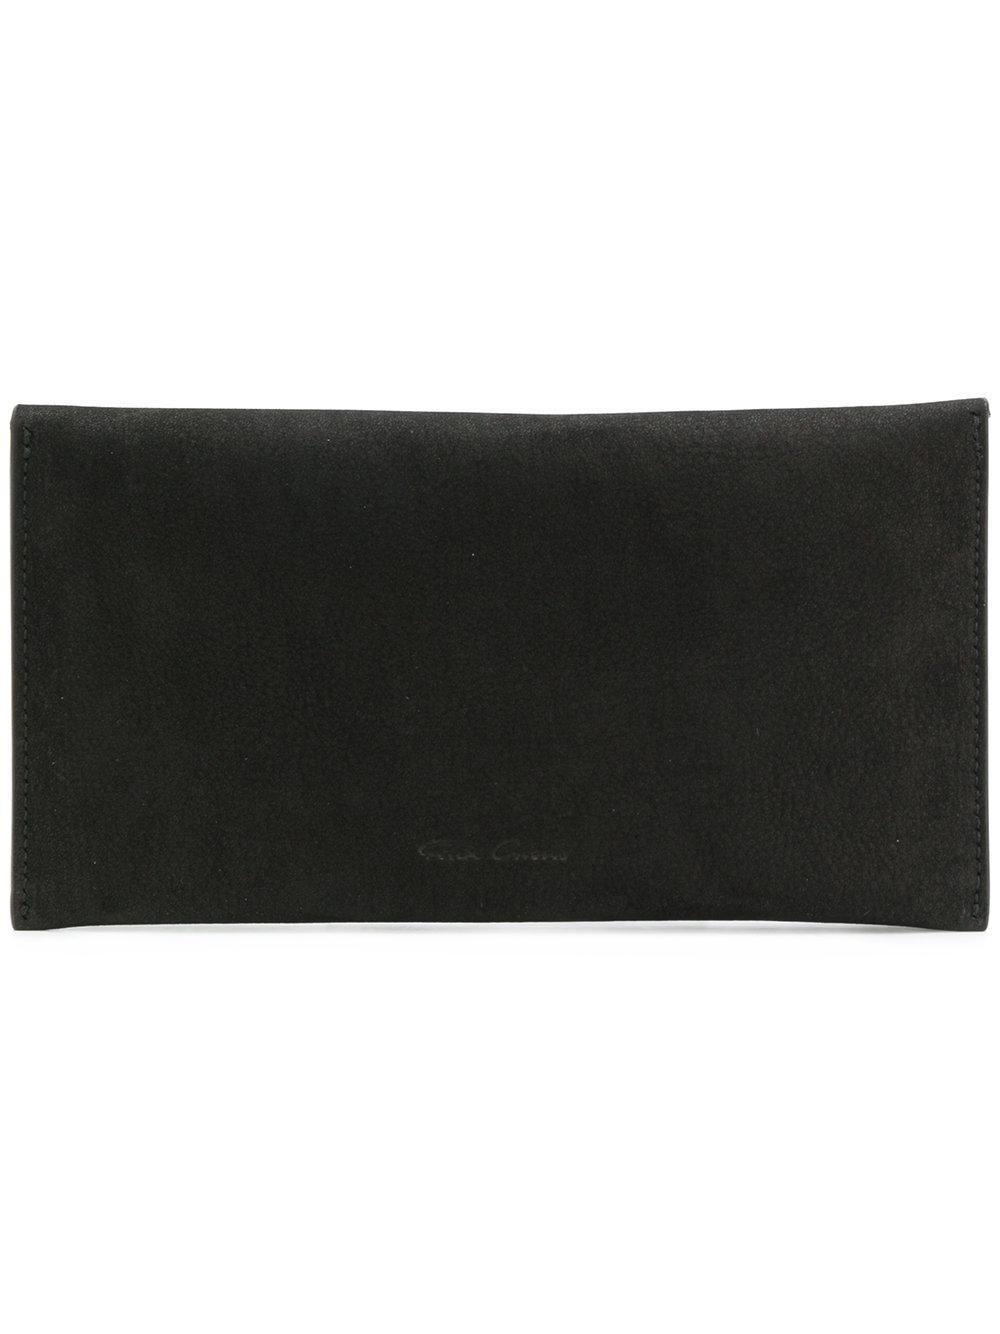 Rick Owens Flap Wallet